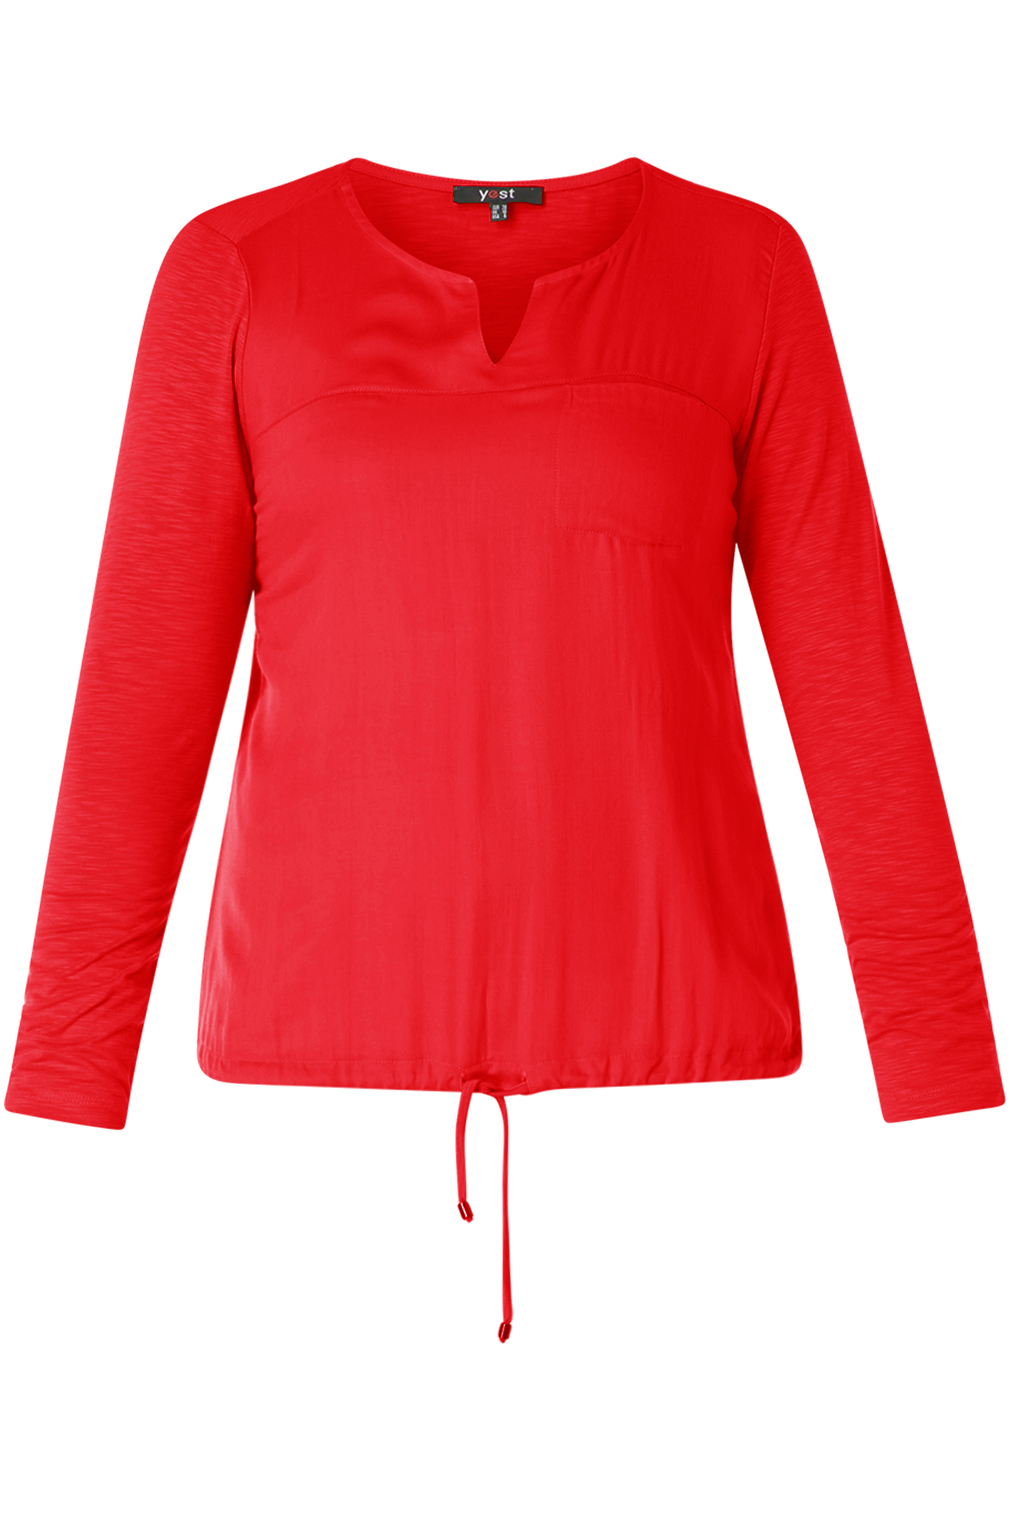 Shirt Gedmond Yesta 64 CM